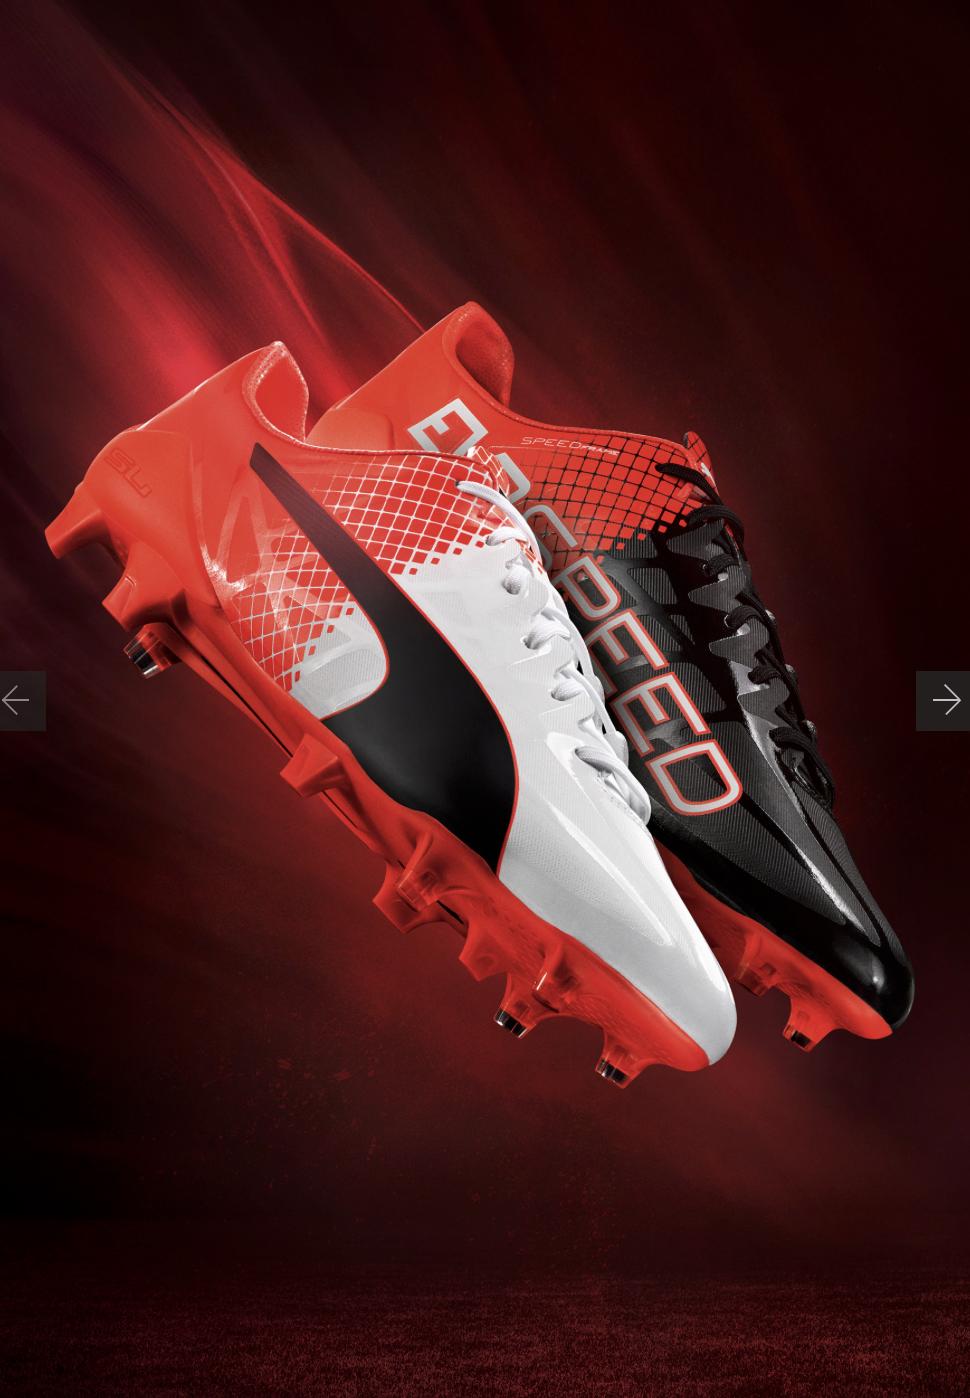 online store de049 cf44b Football Boots, Palettes, Cleats, Football Shoes